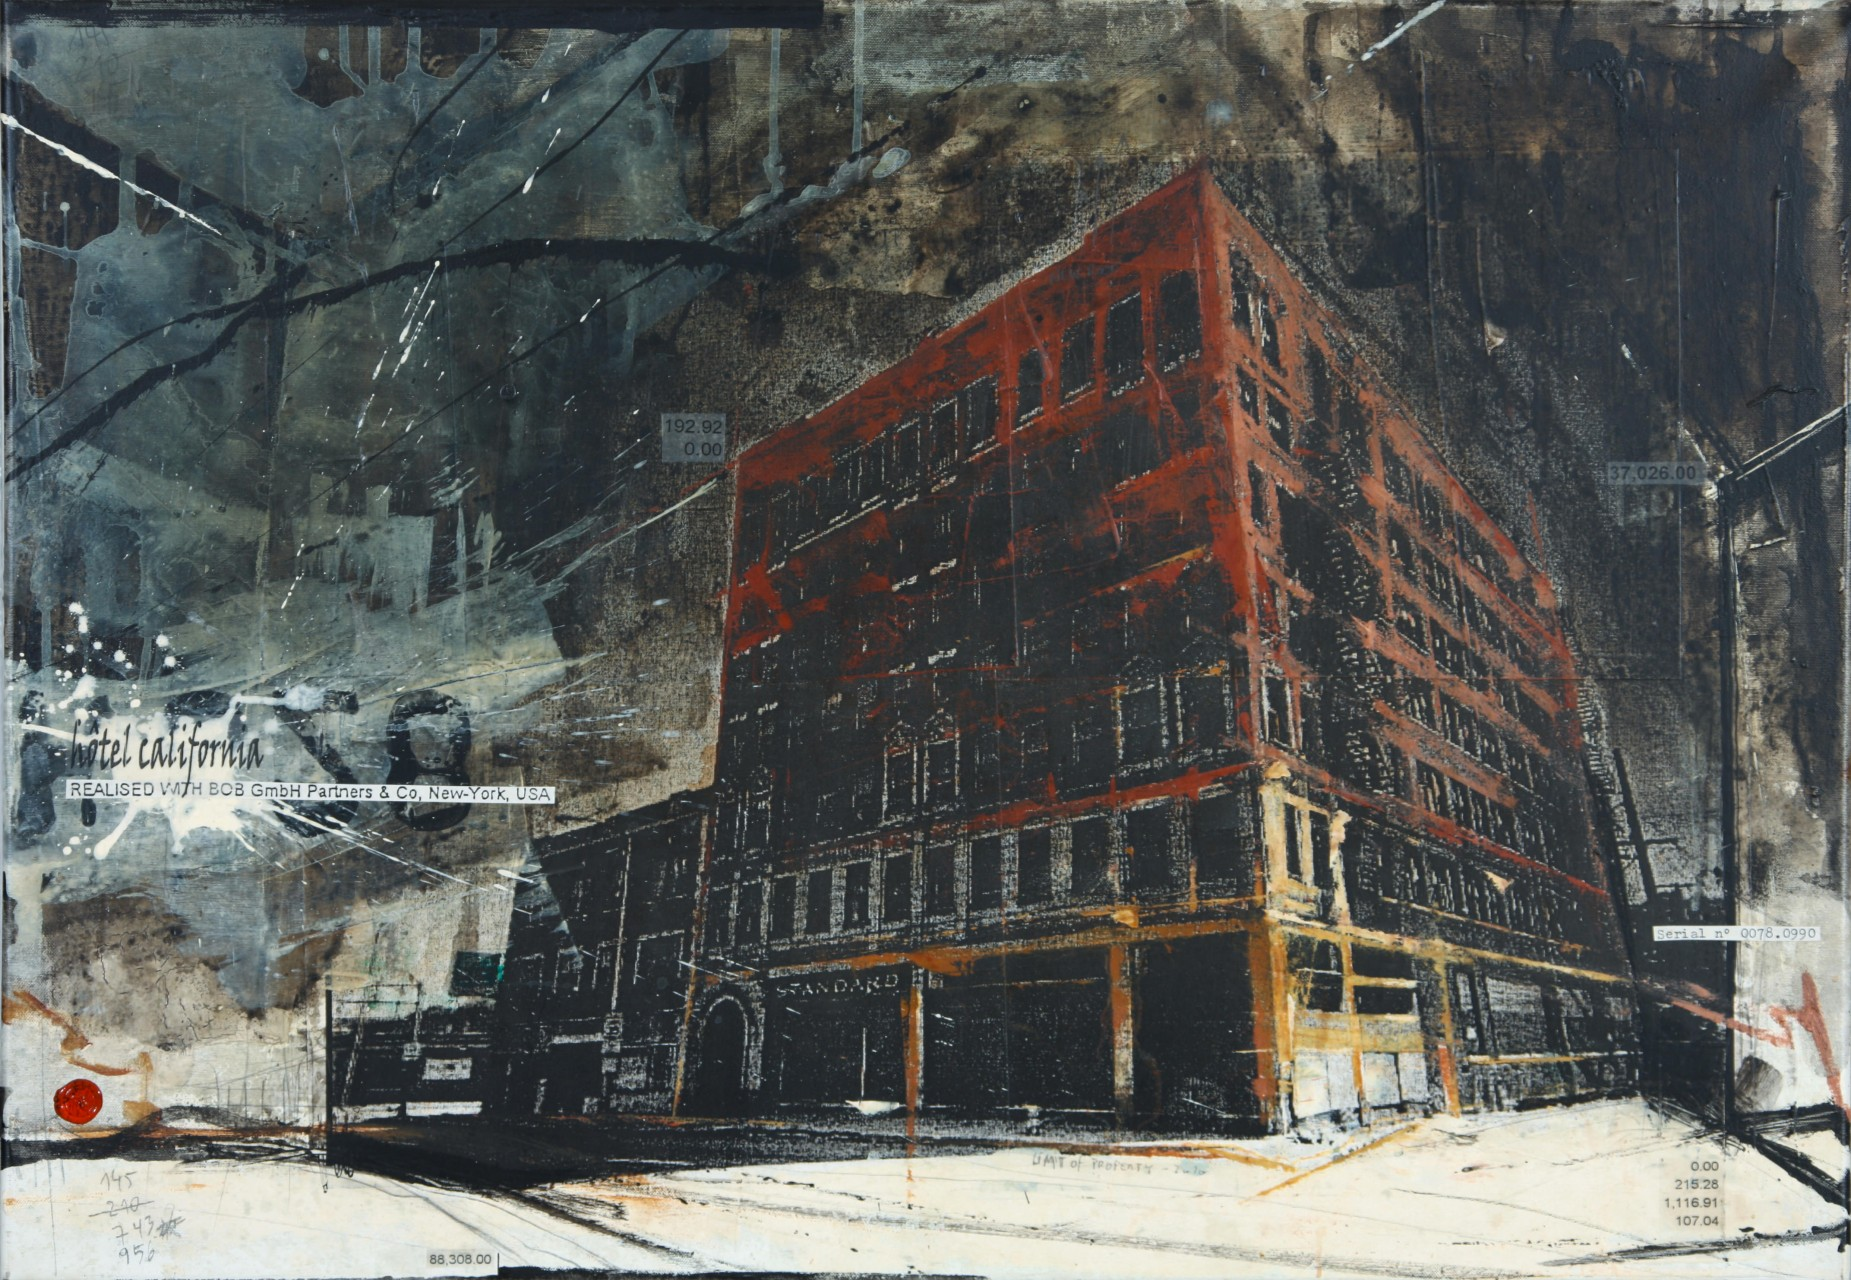 Hotel California - Gary (USA) - collage photo, huile, acrylique sur toile - 70 x 100 cm - 2010